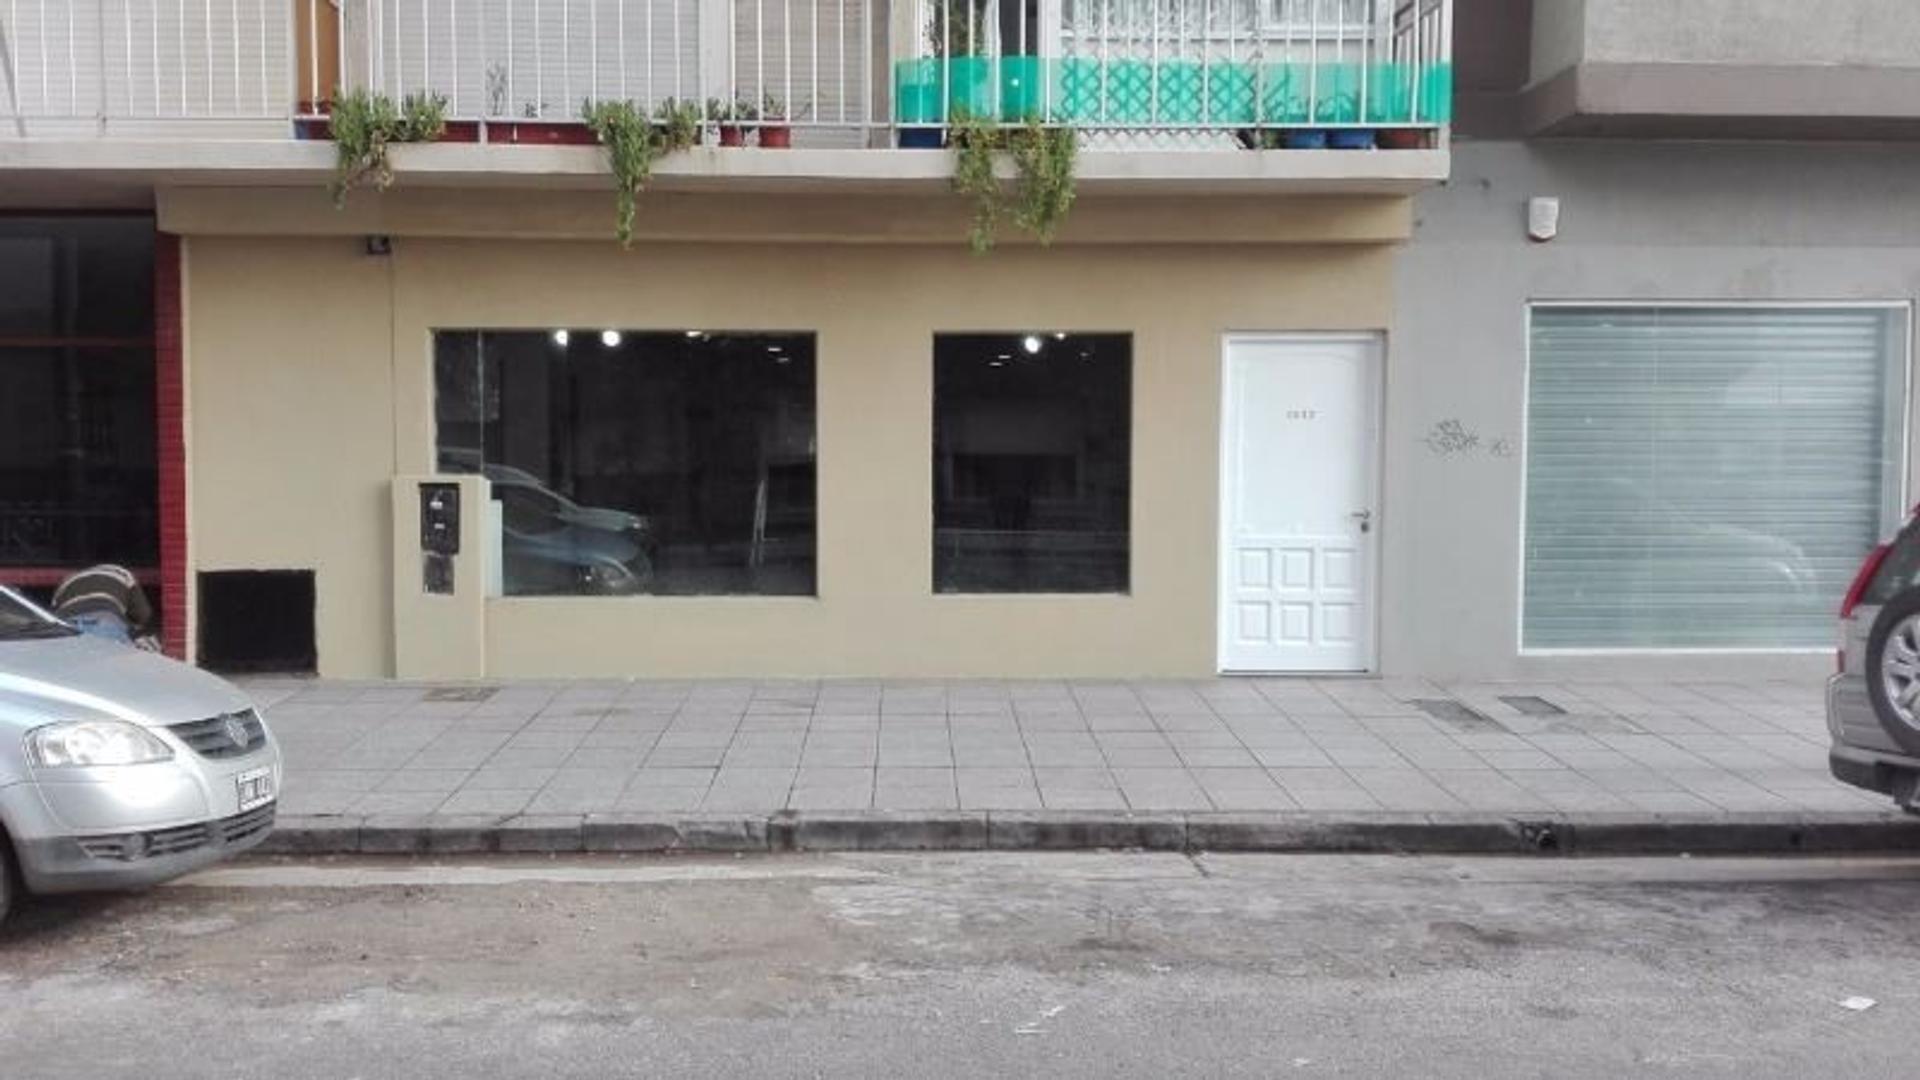 Venta - Local a la calle | Zona Centro | Apto Gastronomía |